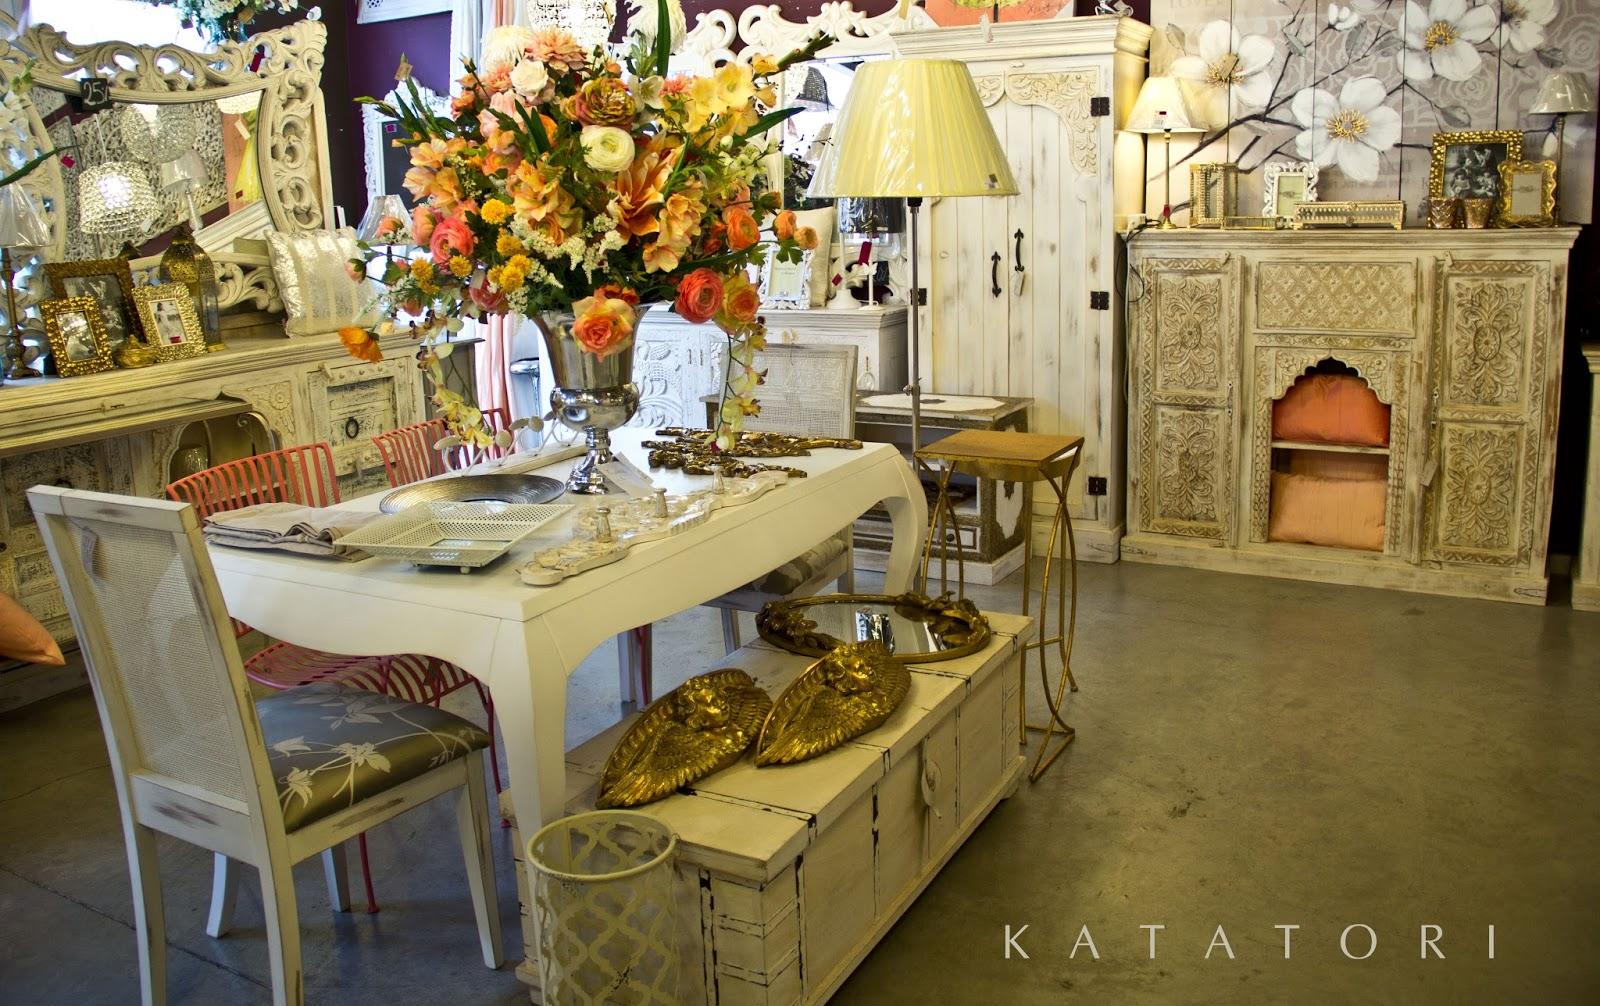 Katatori interiores blanco - Muebles decoracion sevilla ...